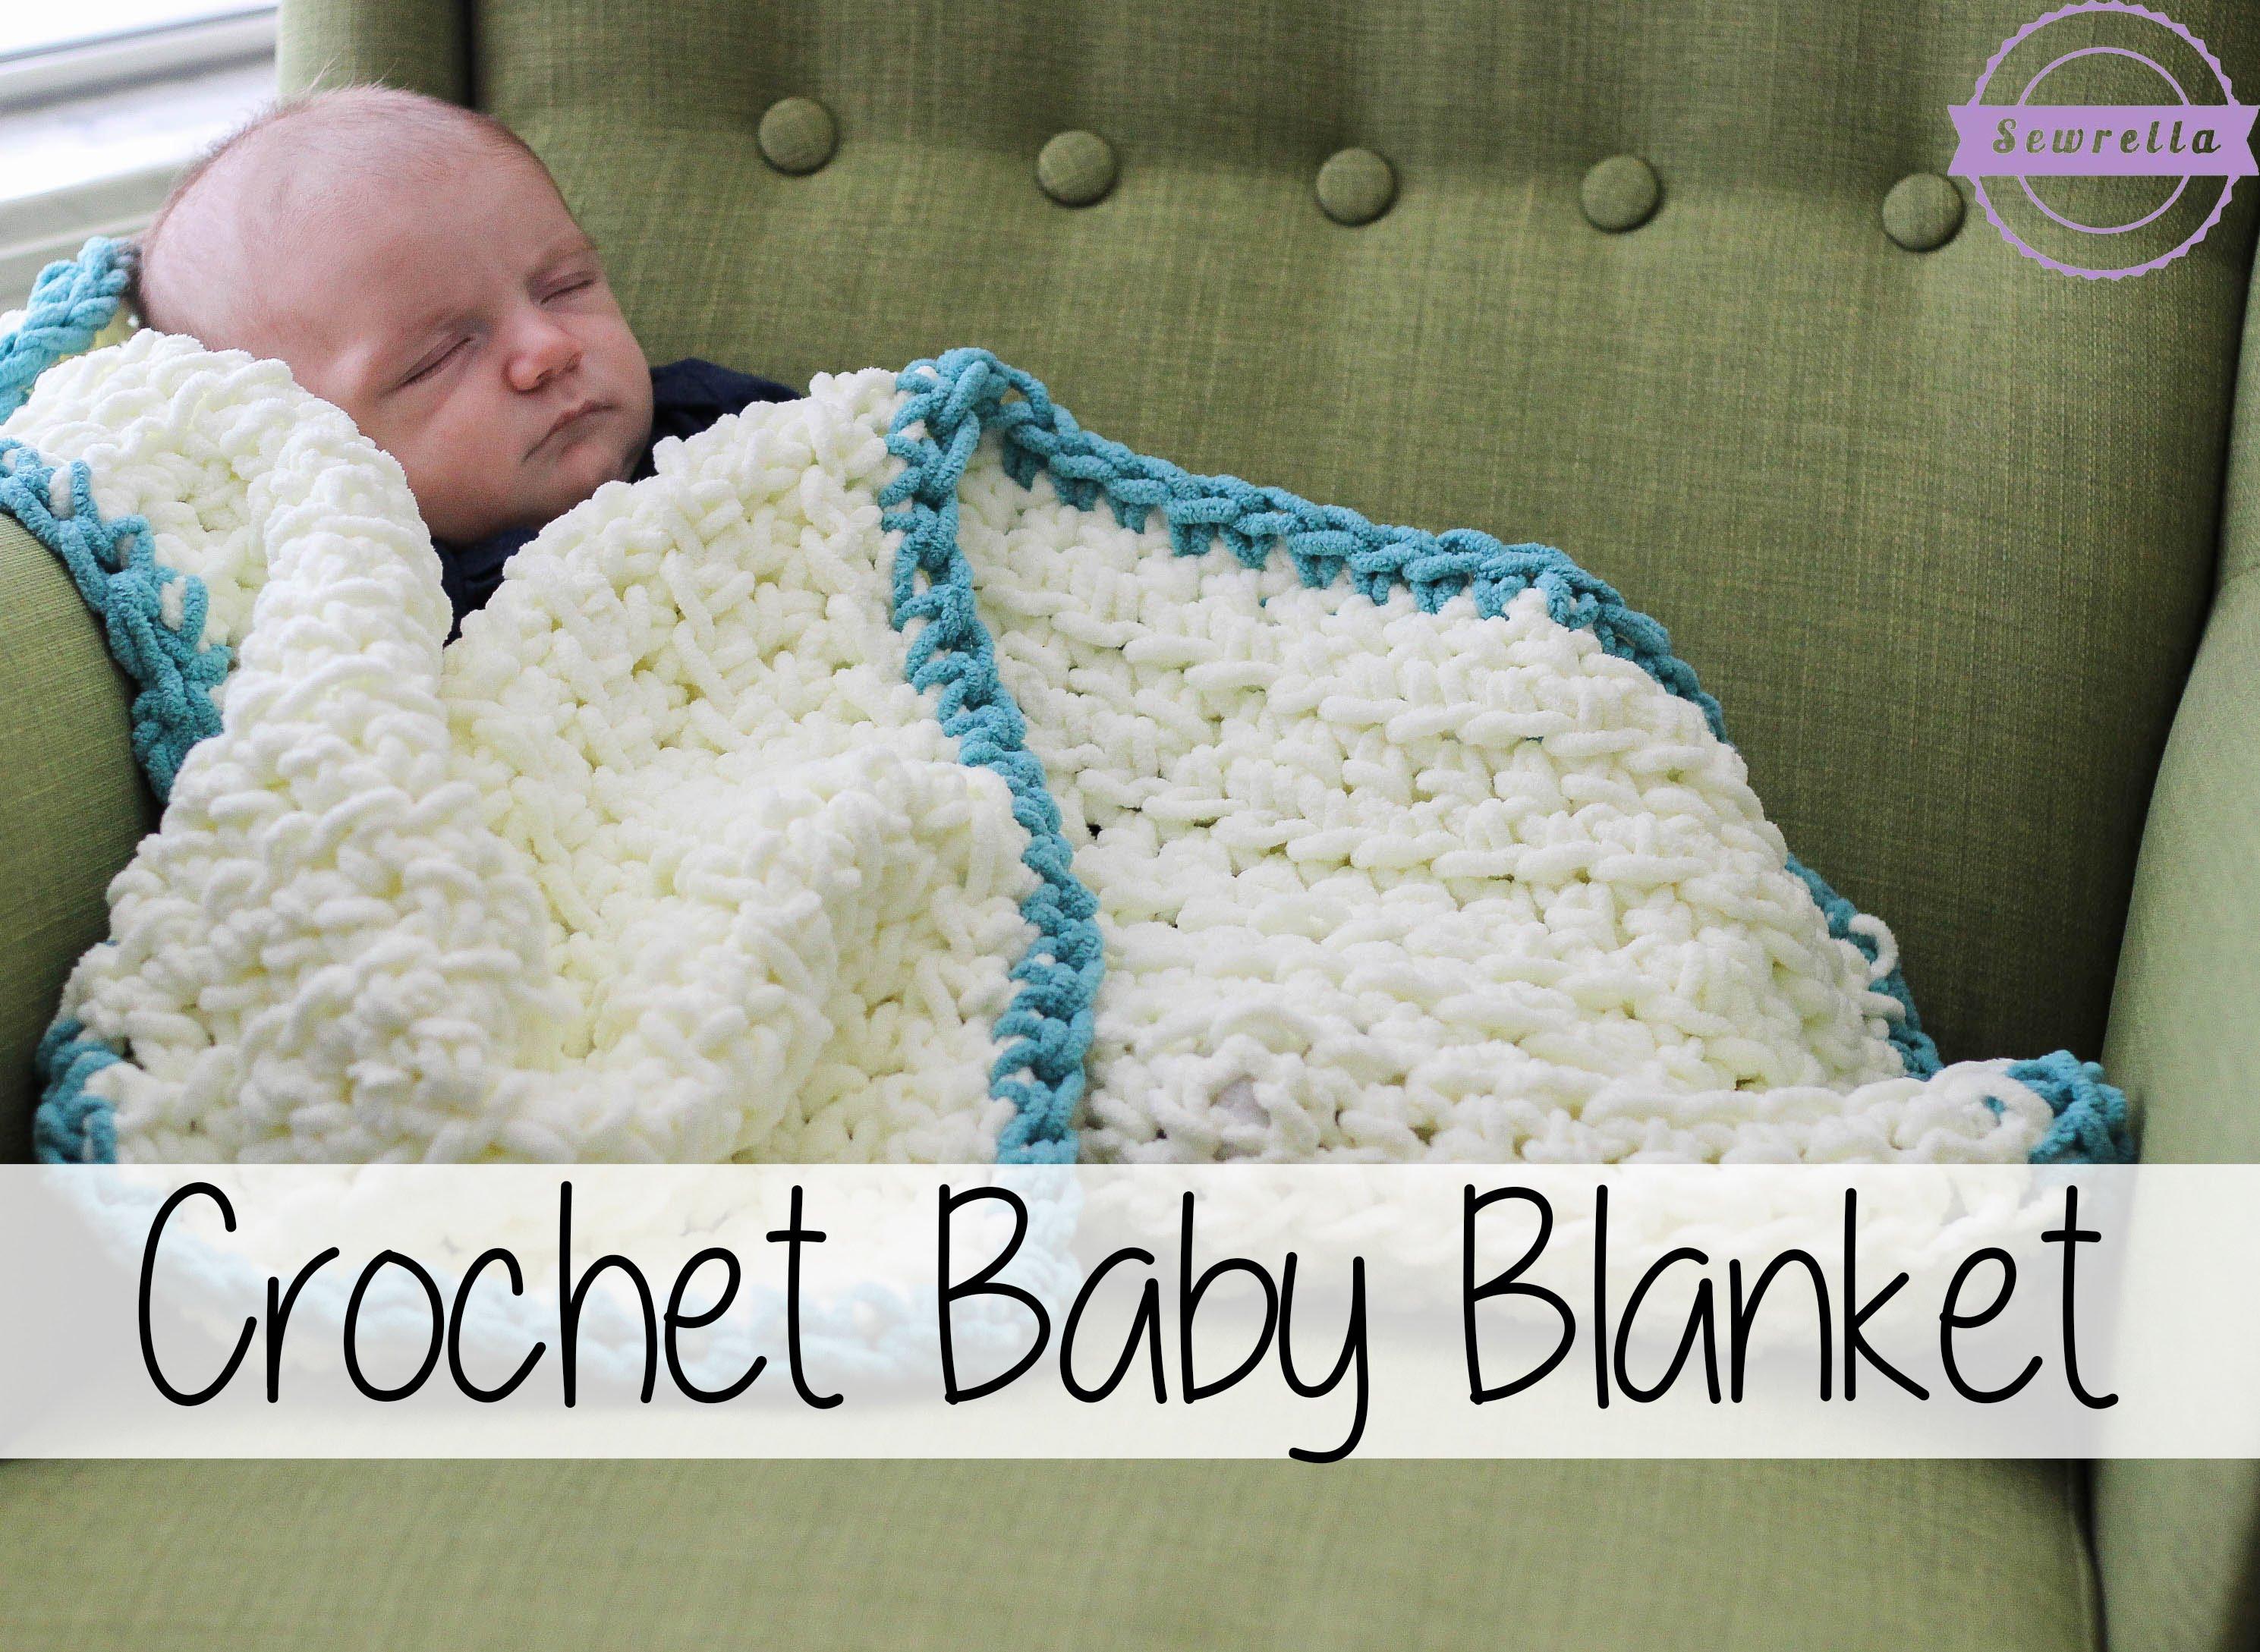 easy crochet baby blanket easy beginner crochet baby blanket | sewrella ipxsxvb